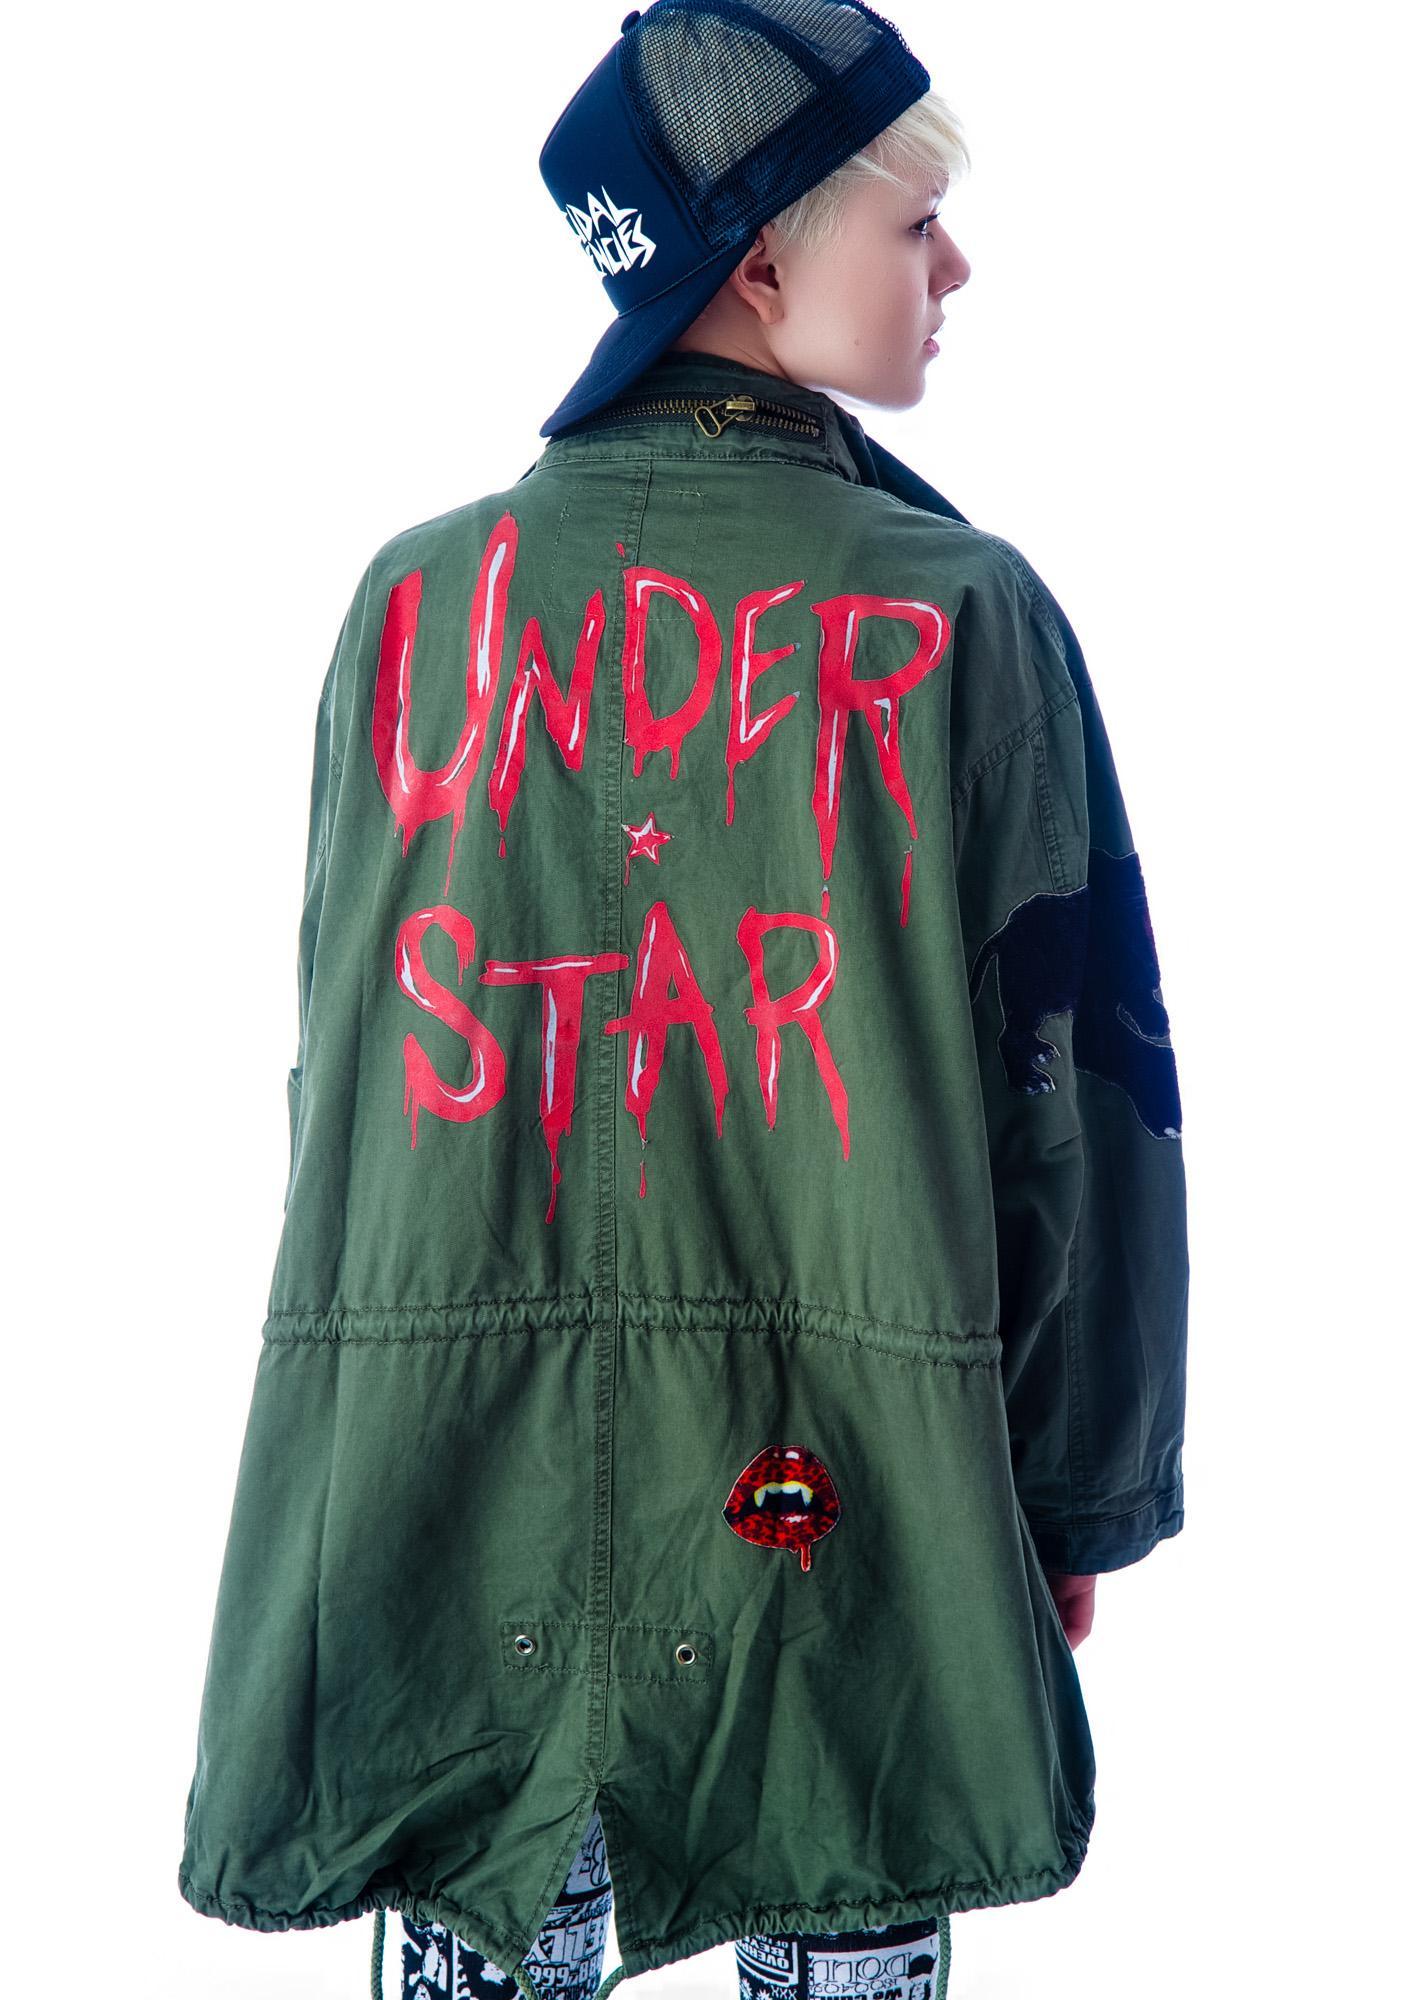 Skull Rocker Military Surplus Jacket